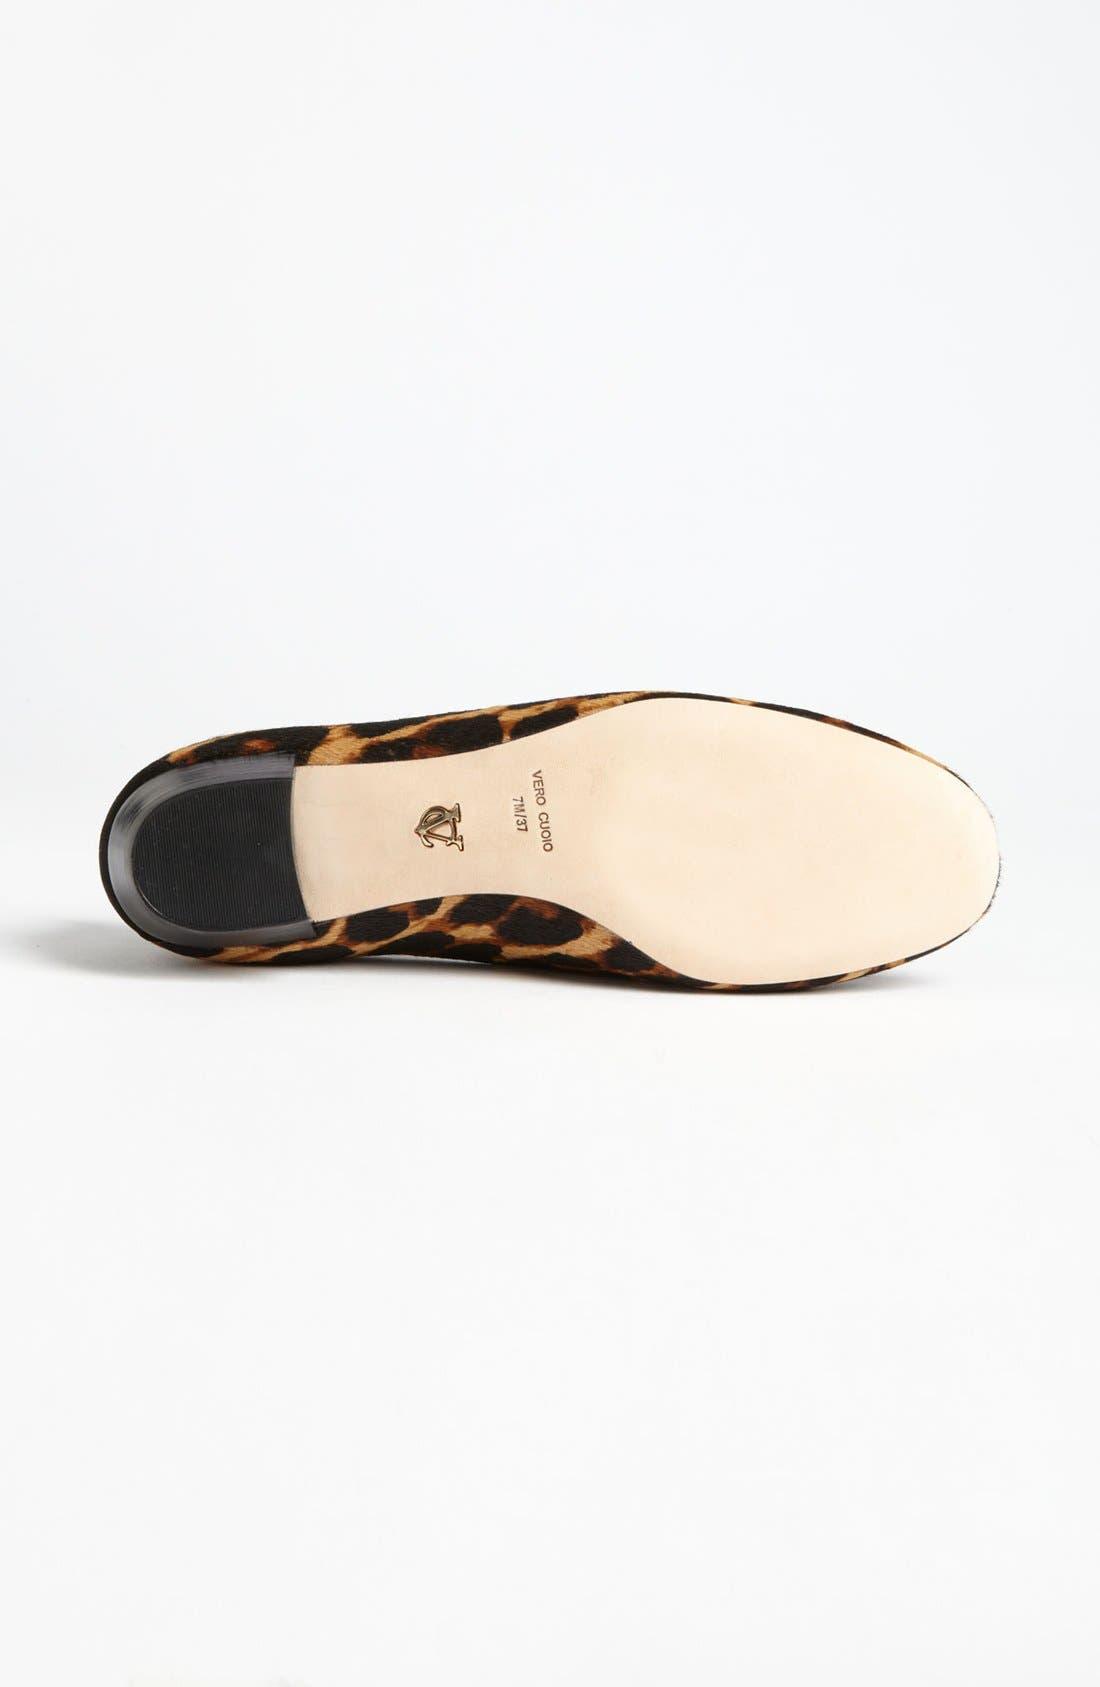 'Nancy' Loafer,                             Alternate thumbnail 4, color,                             Leopard Haircalf